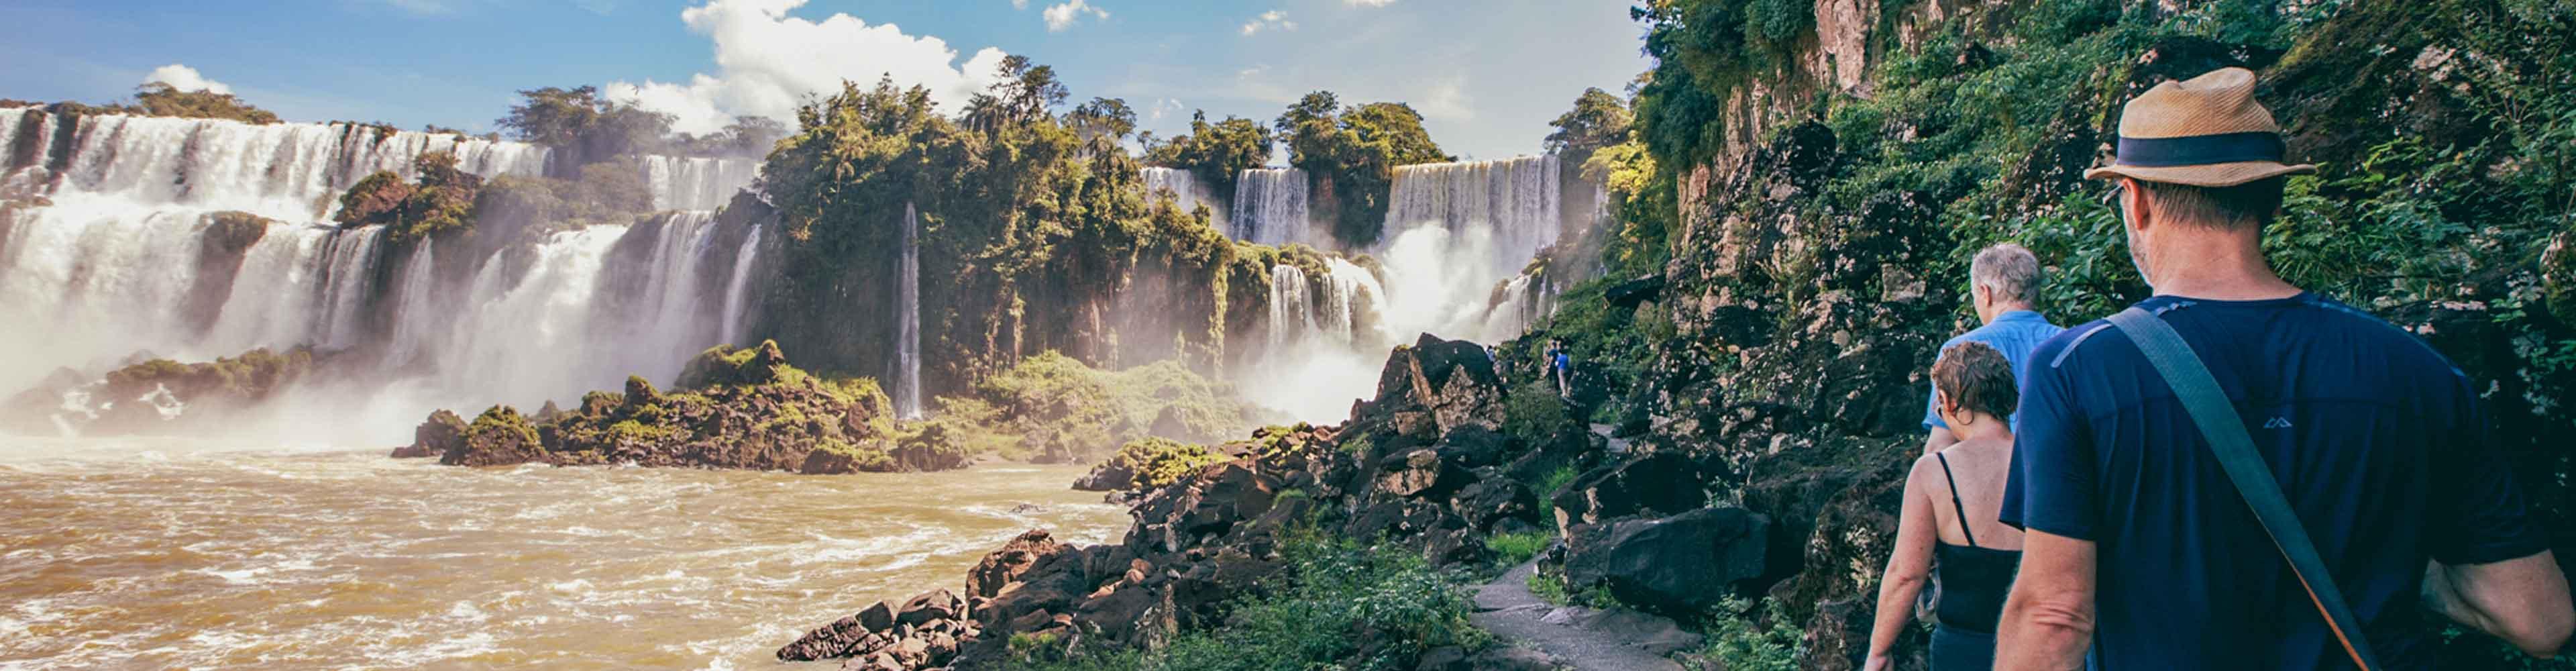 Iguazu Falls Experience – Independent